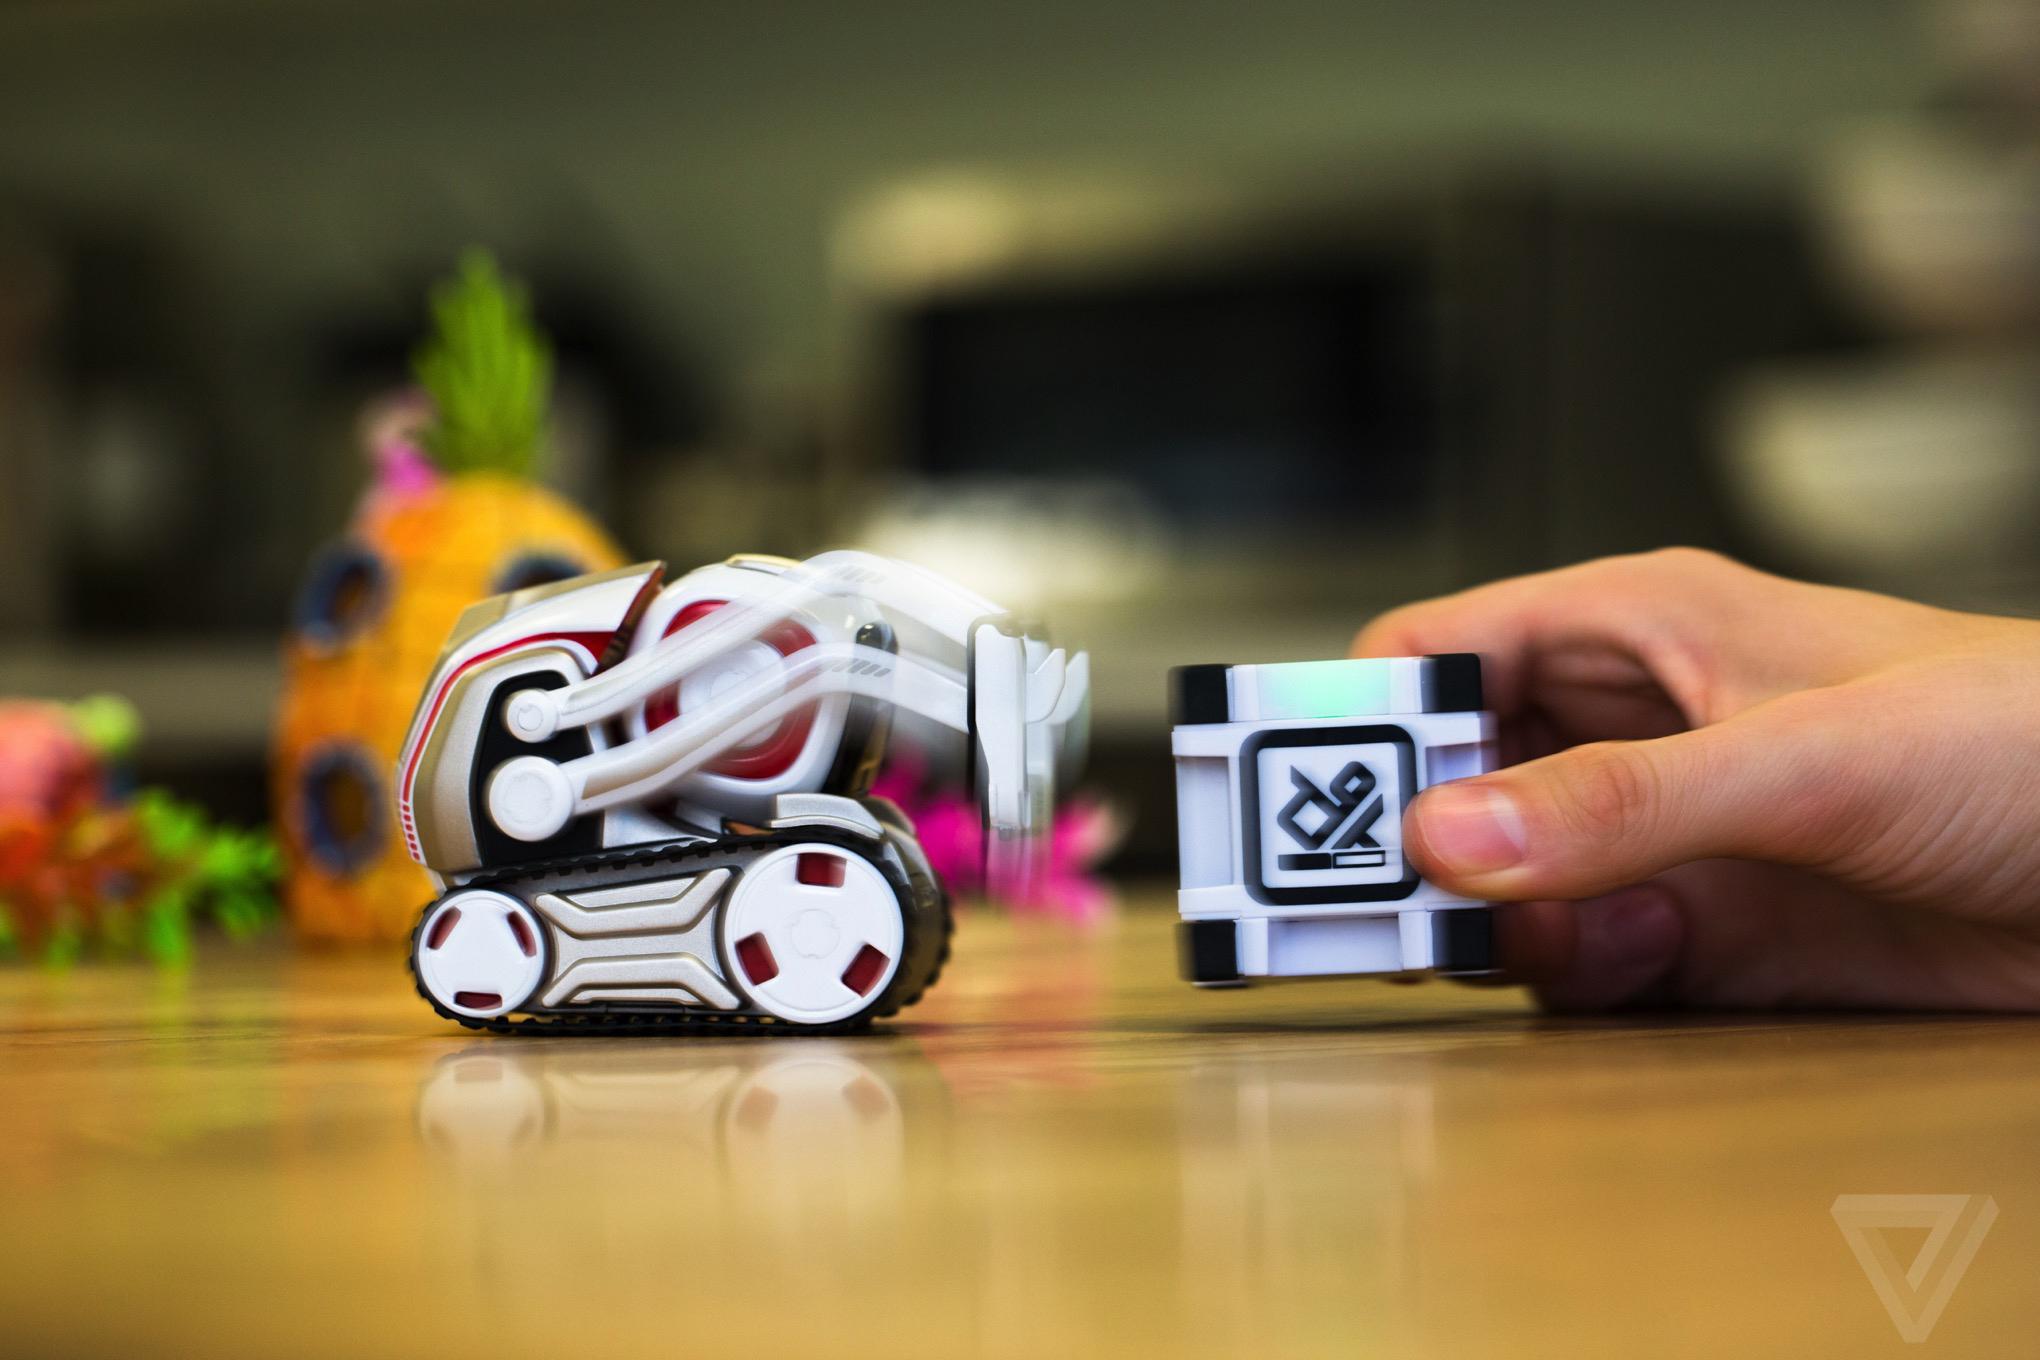 Anki S Cozmo Robot Is The New Adorable Face Of Artificial